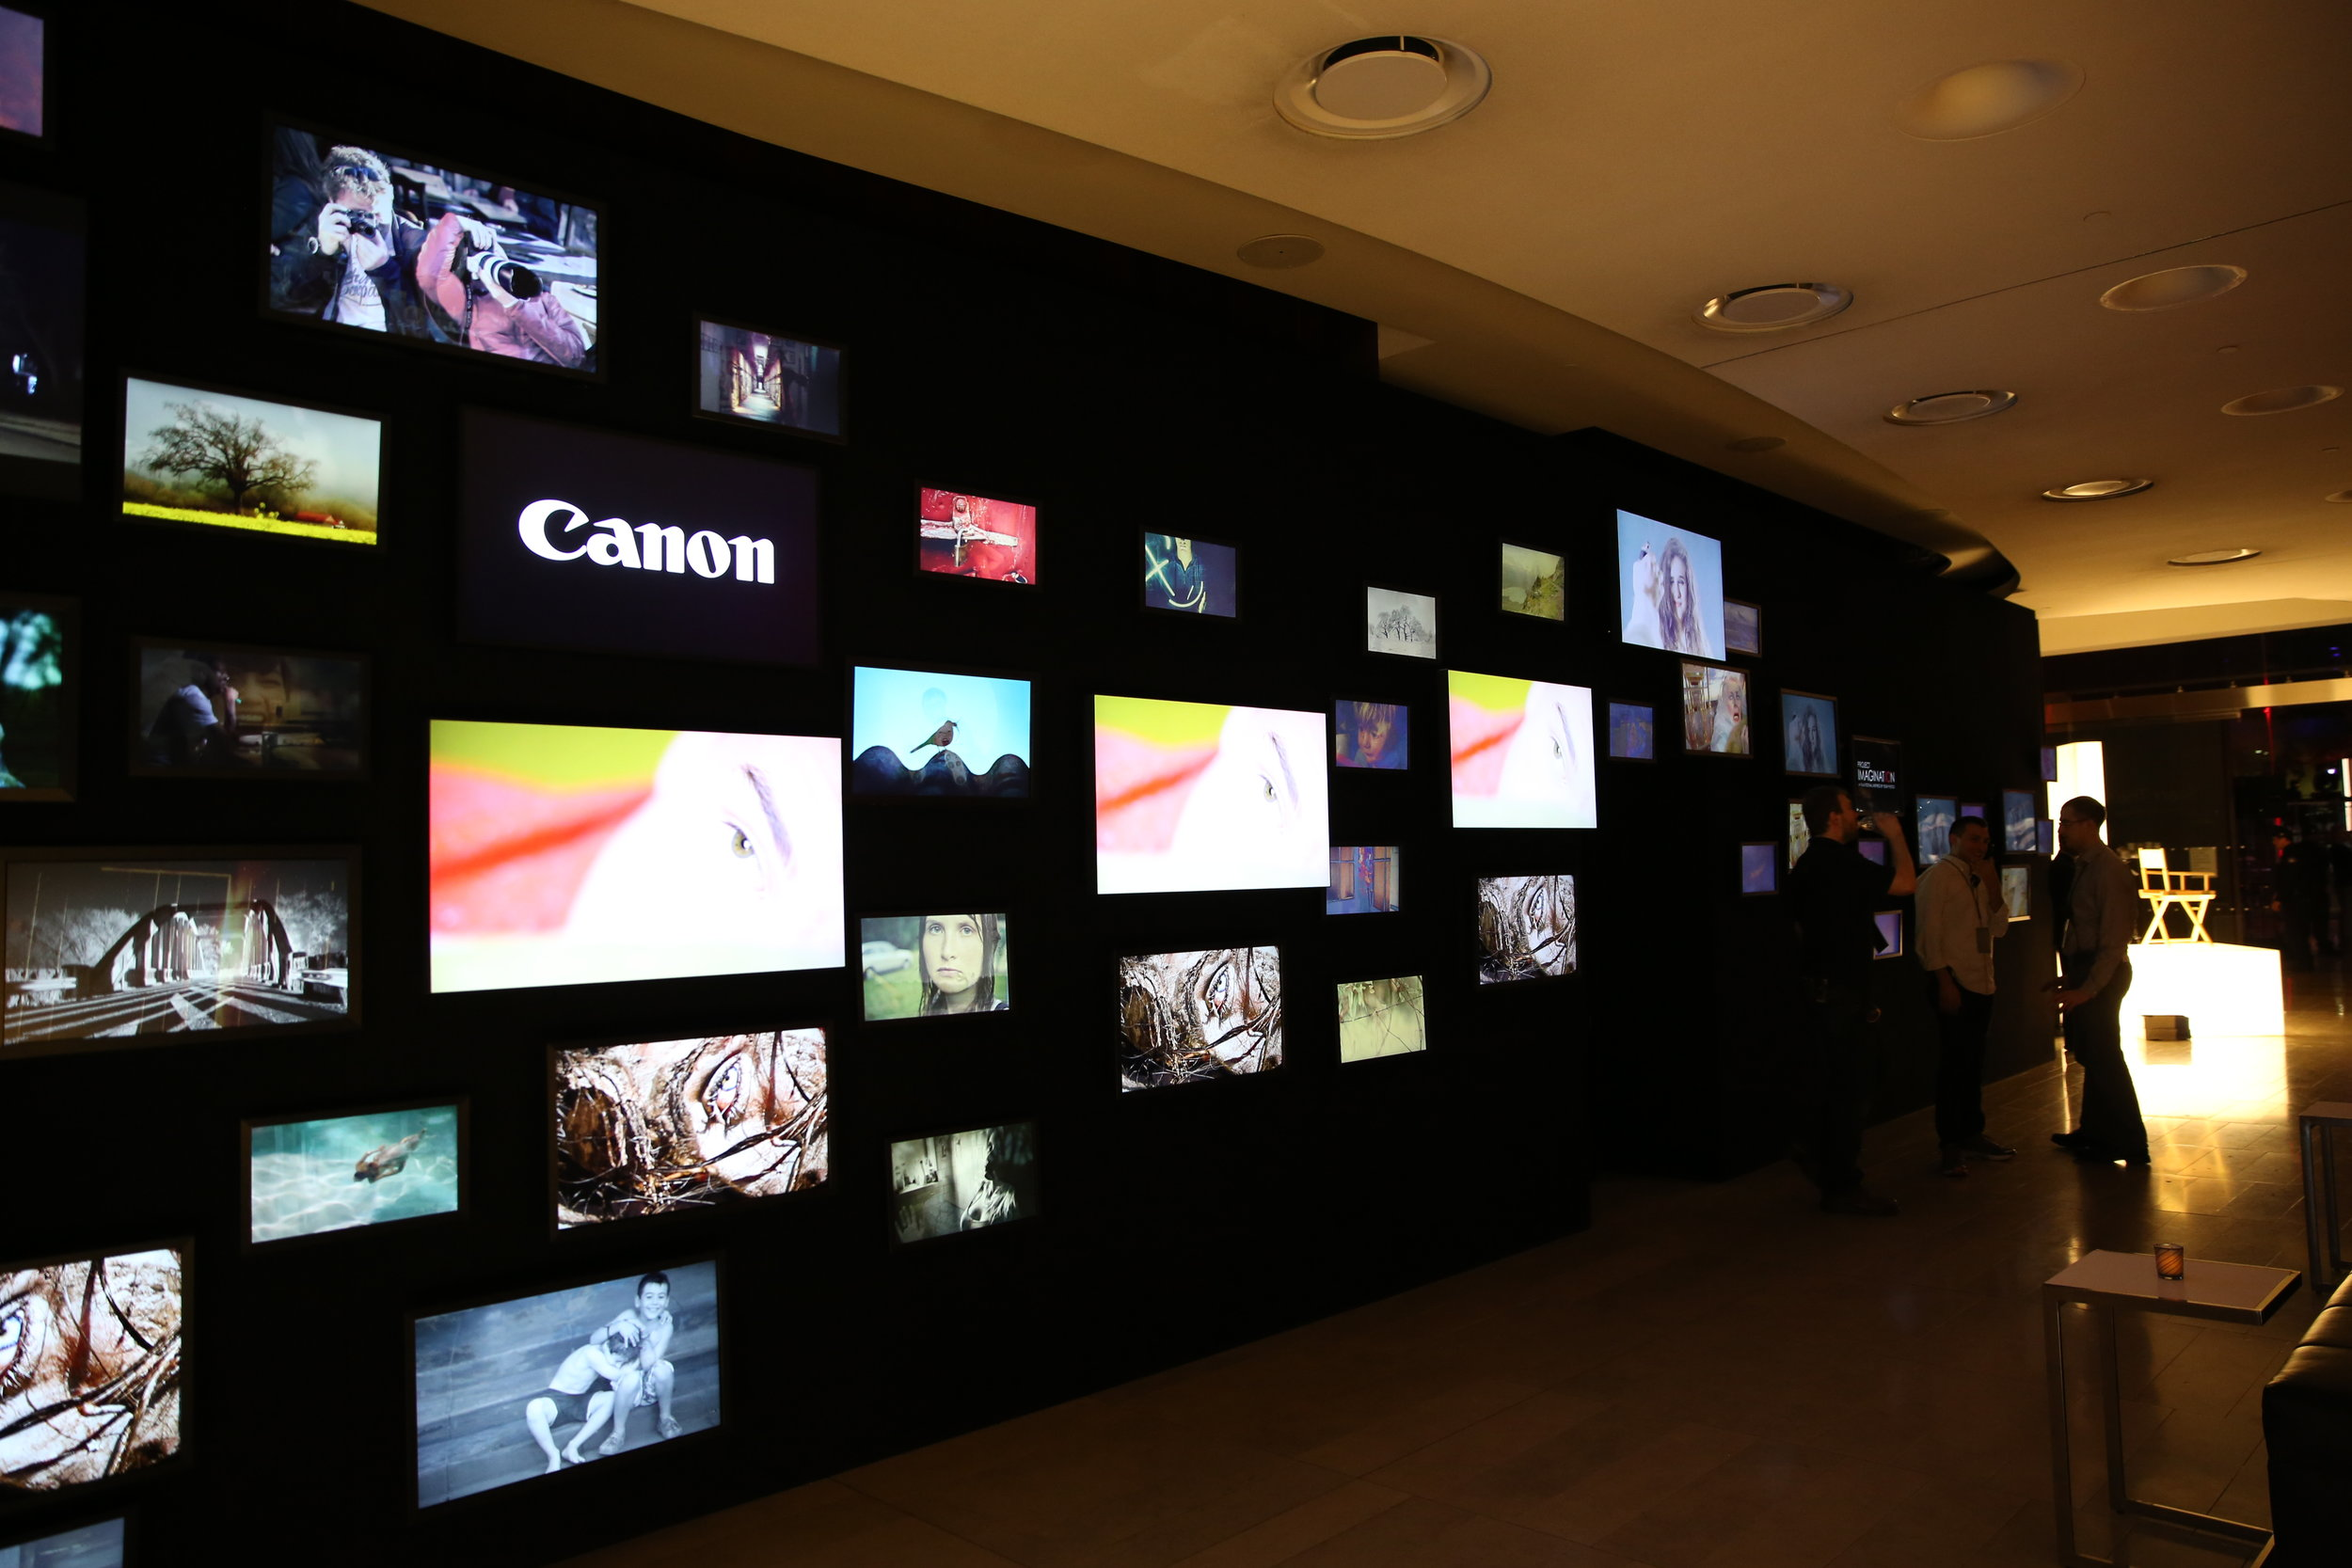 CANON PROJECT IMAGINAT10N 2013